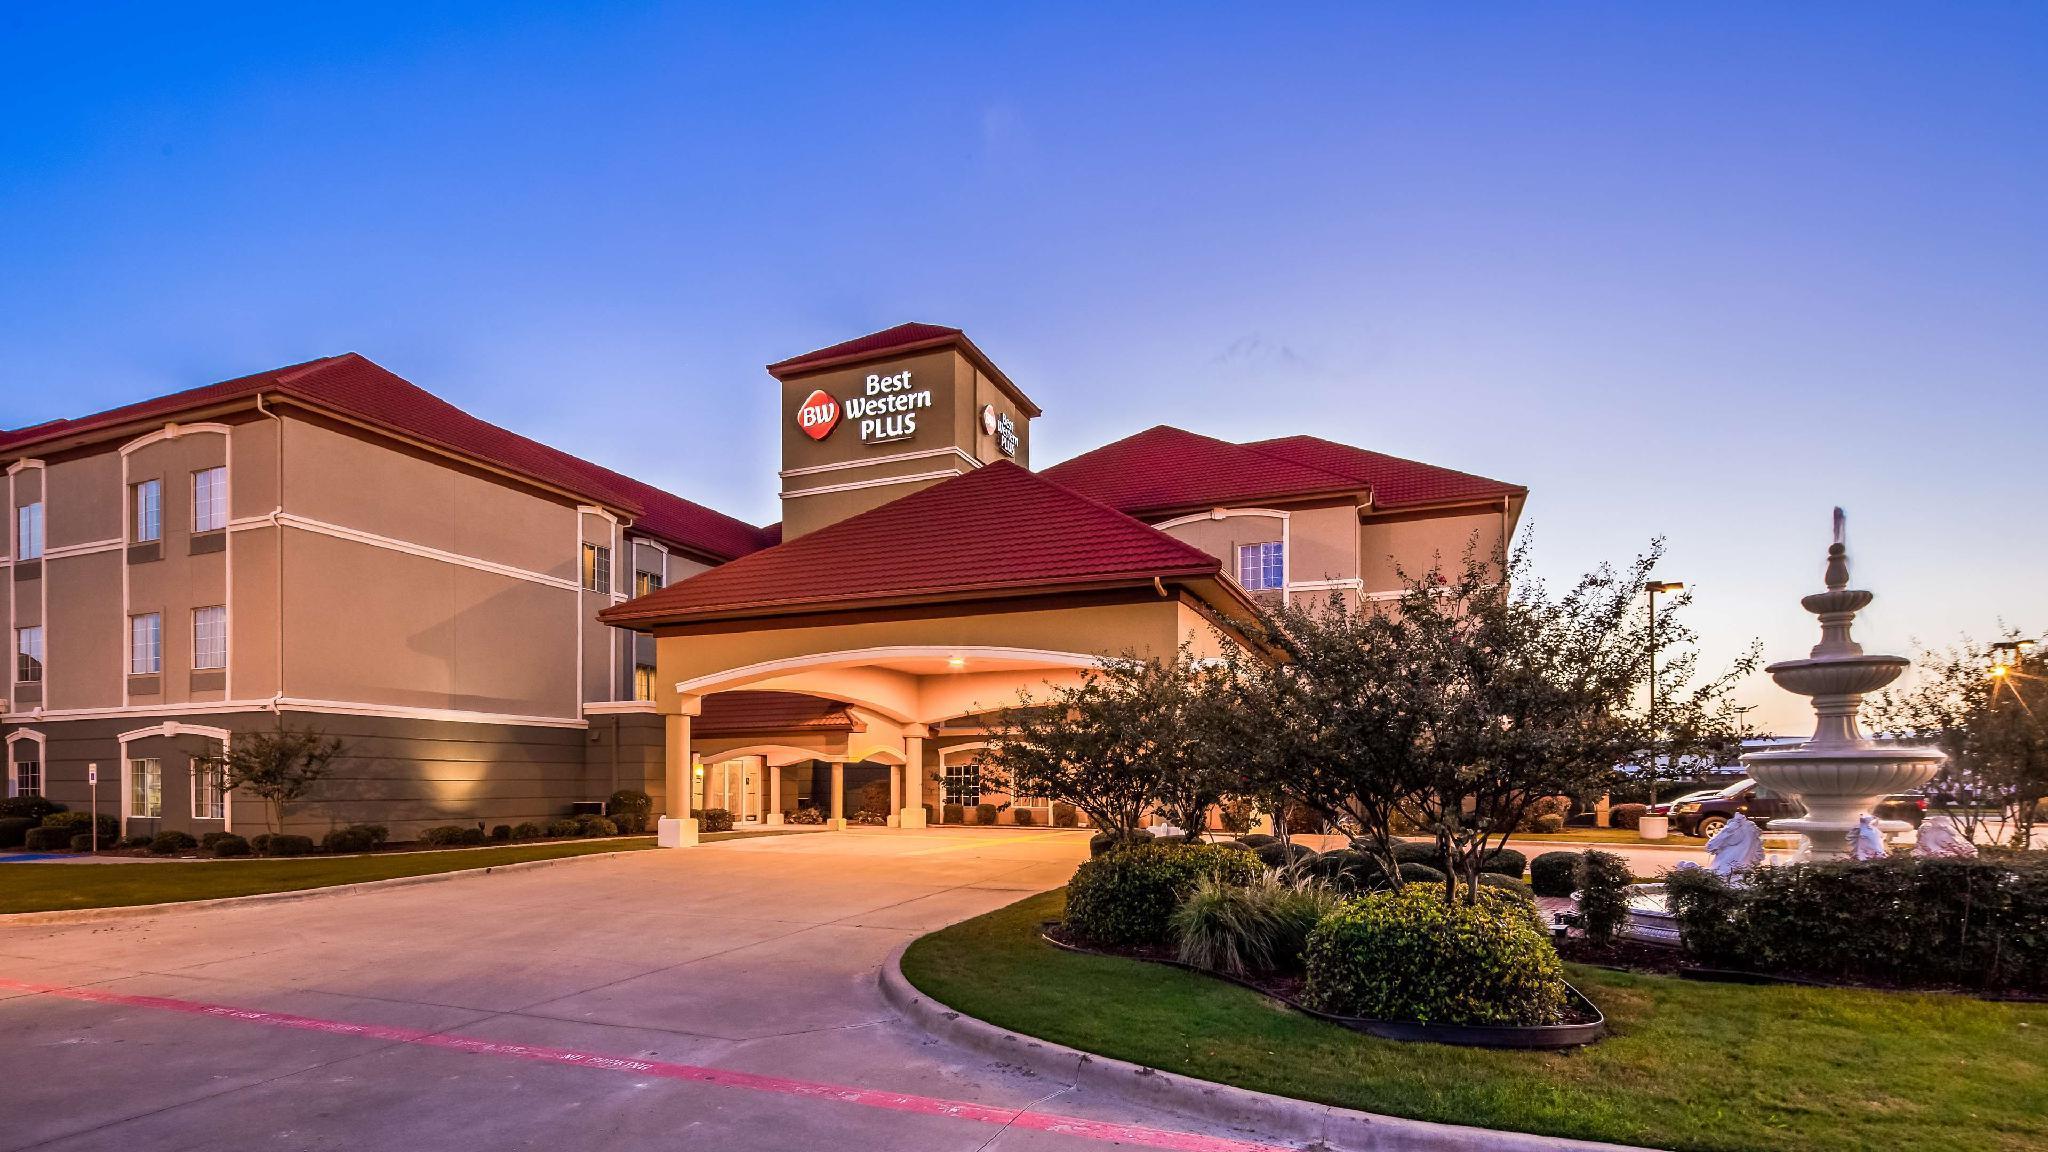 Best Western Plus Monica Royale Inn And Suites